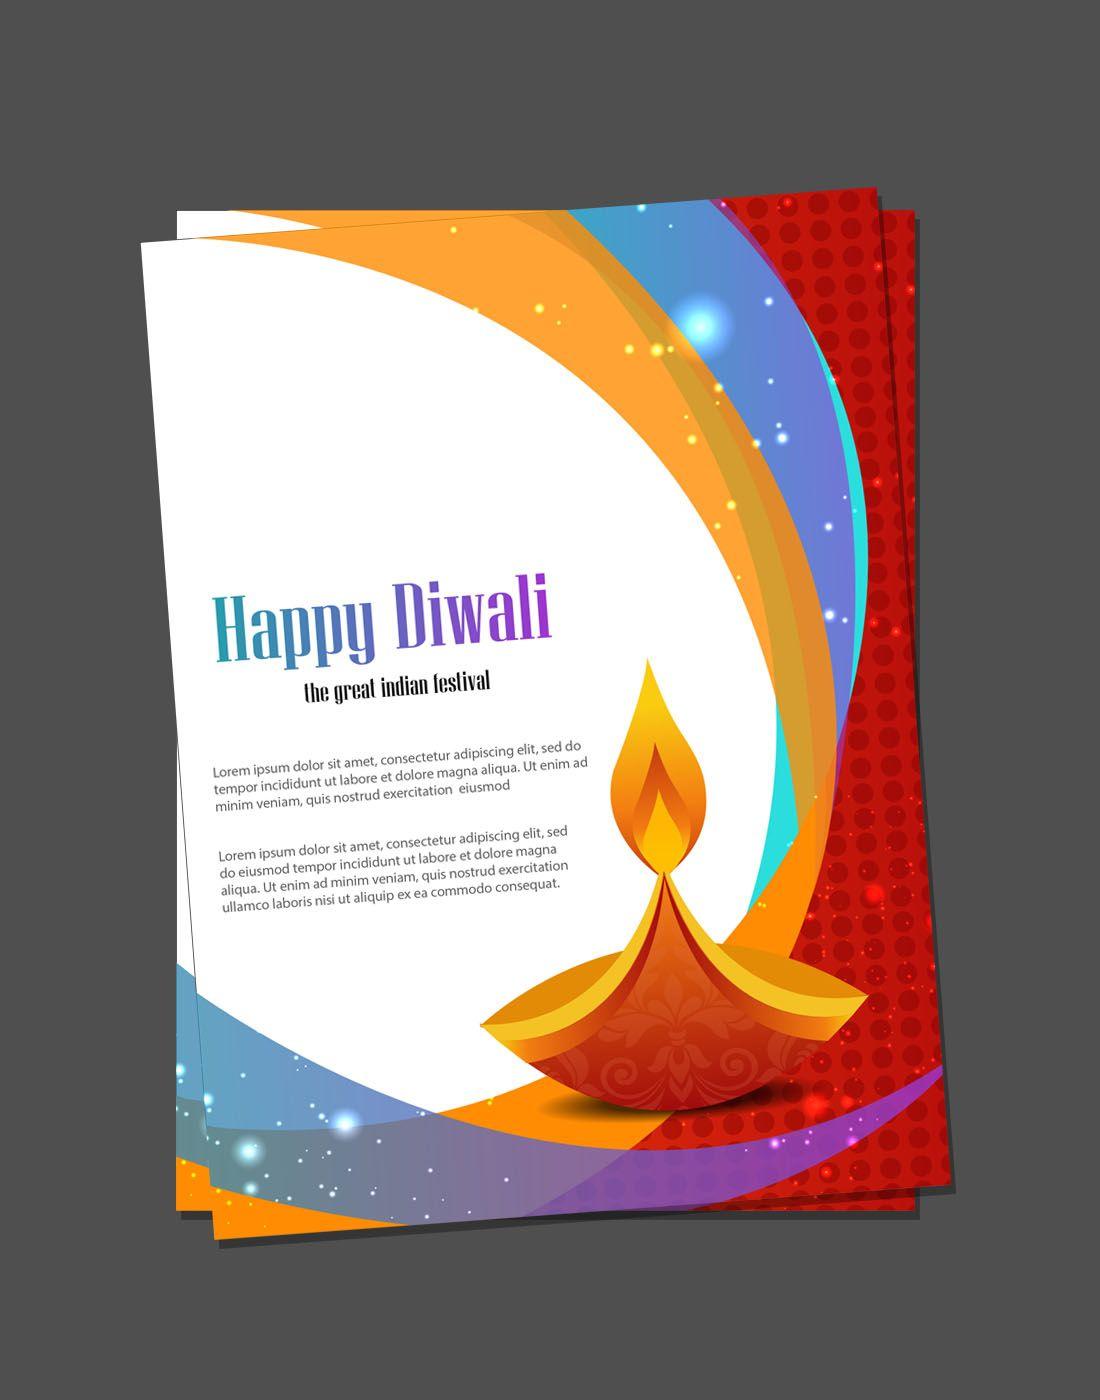 Diwali Graphic Templates Diwali And Template